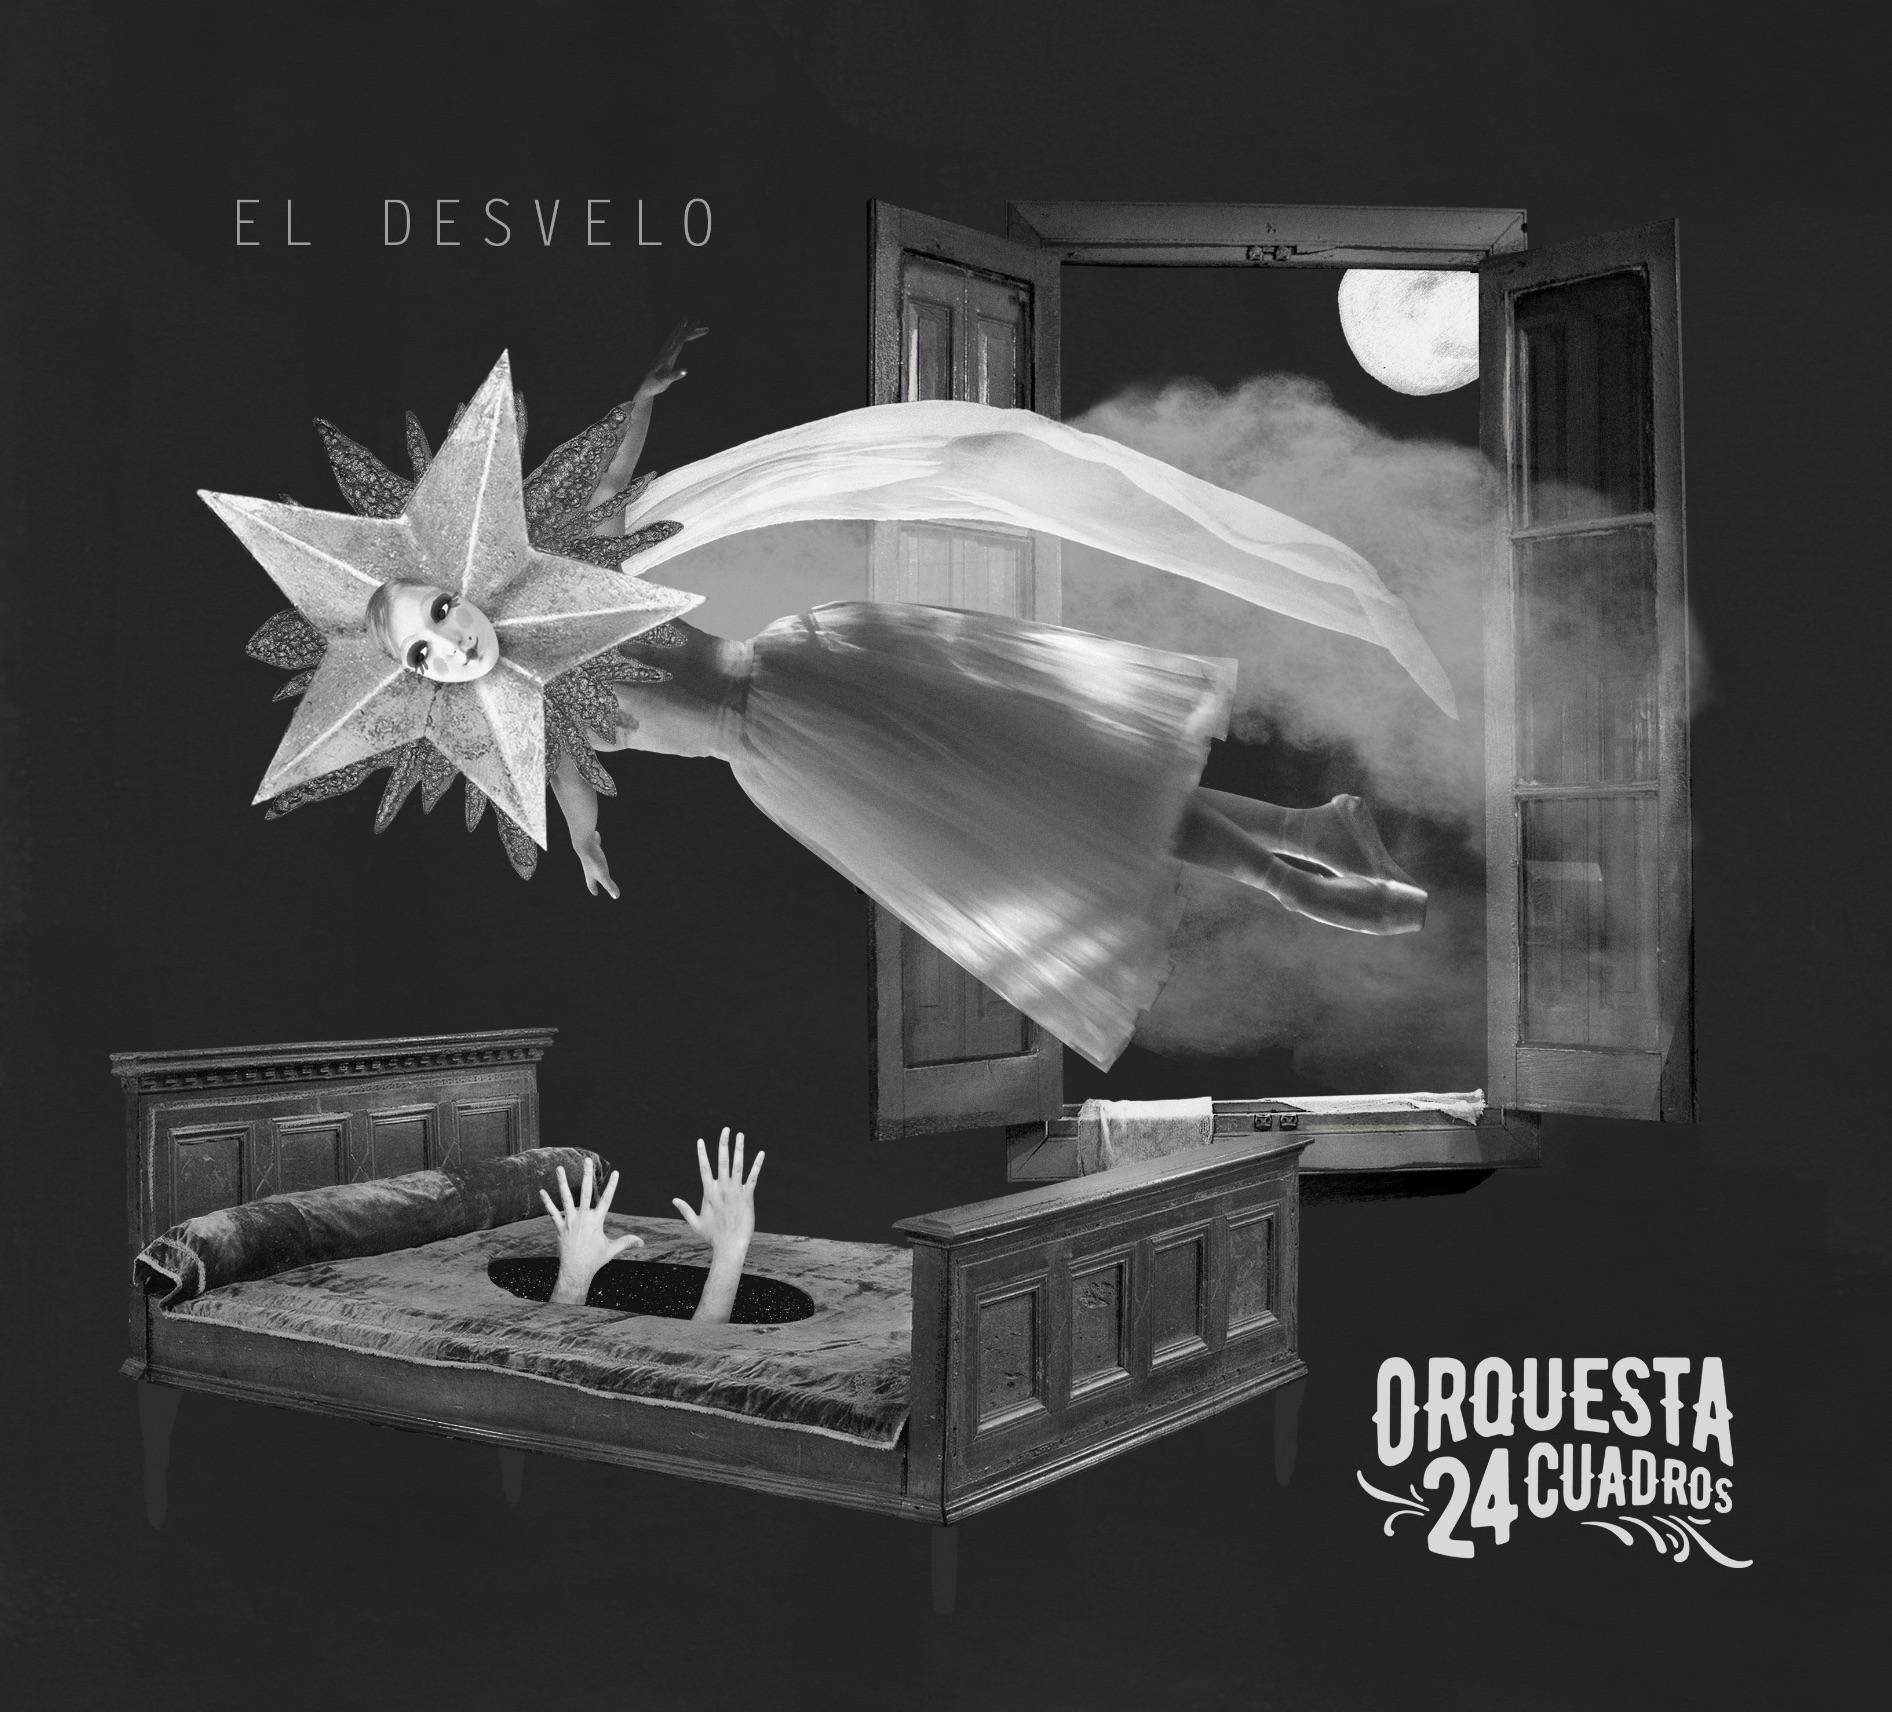 Alt-Rock Band Orquesta 24 Cuadros Stuns With Their New Album